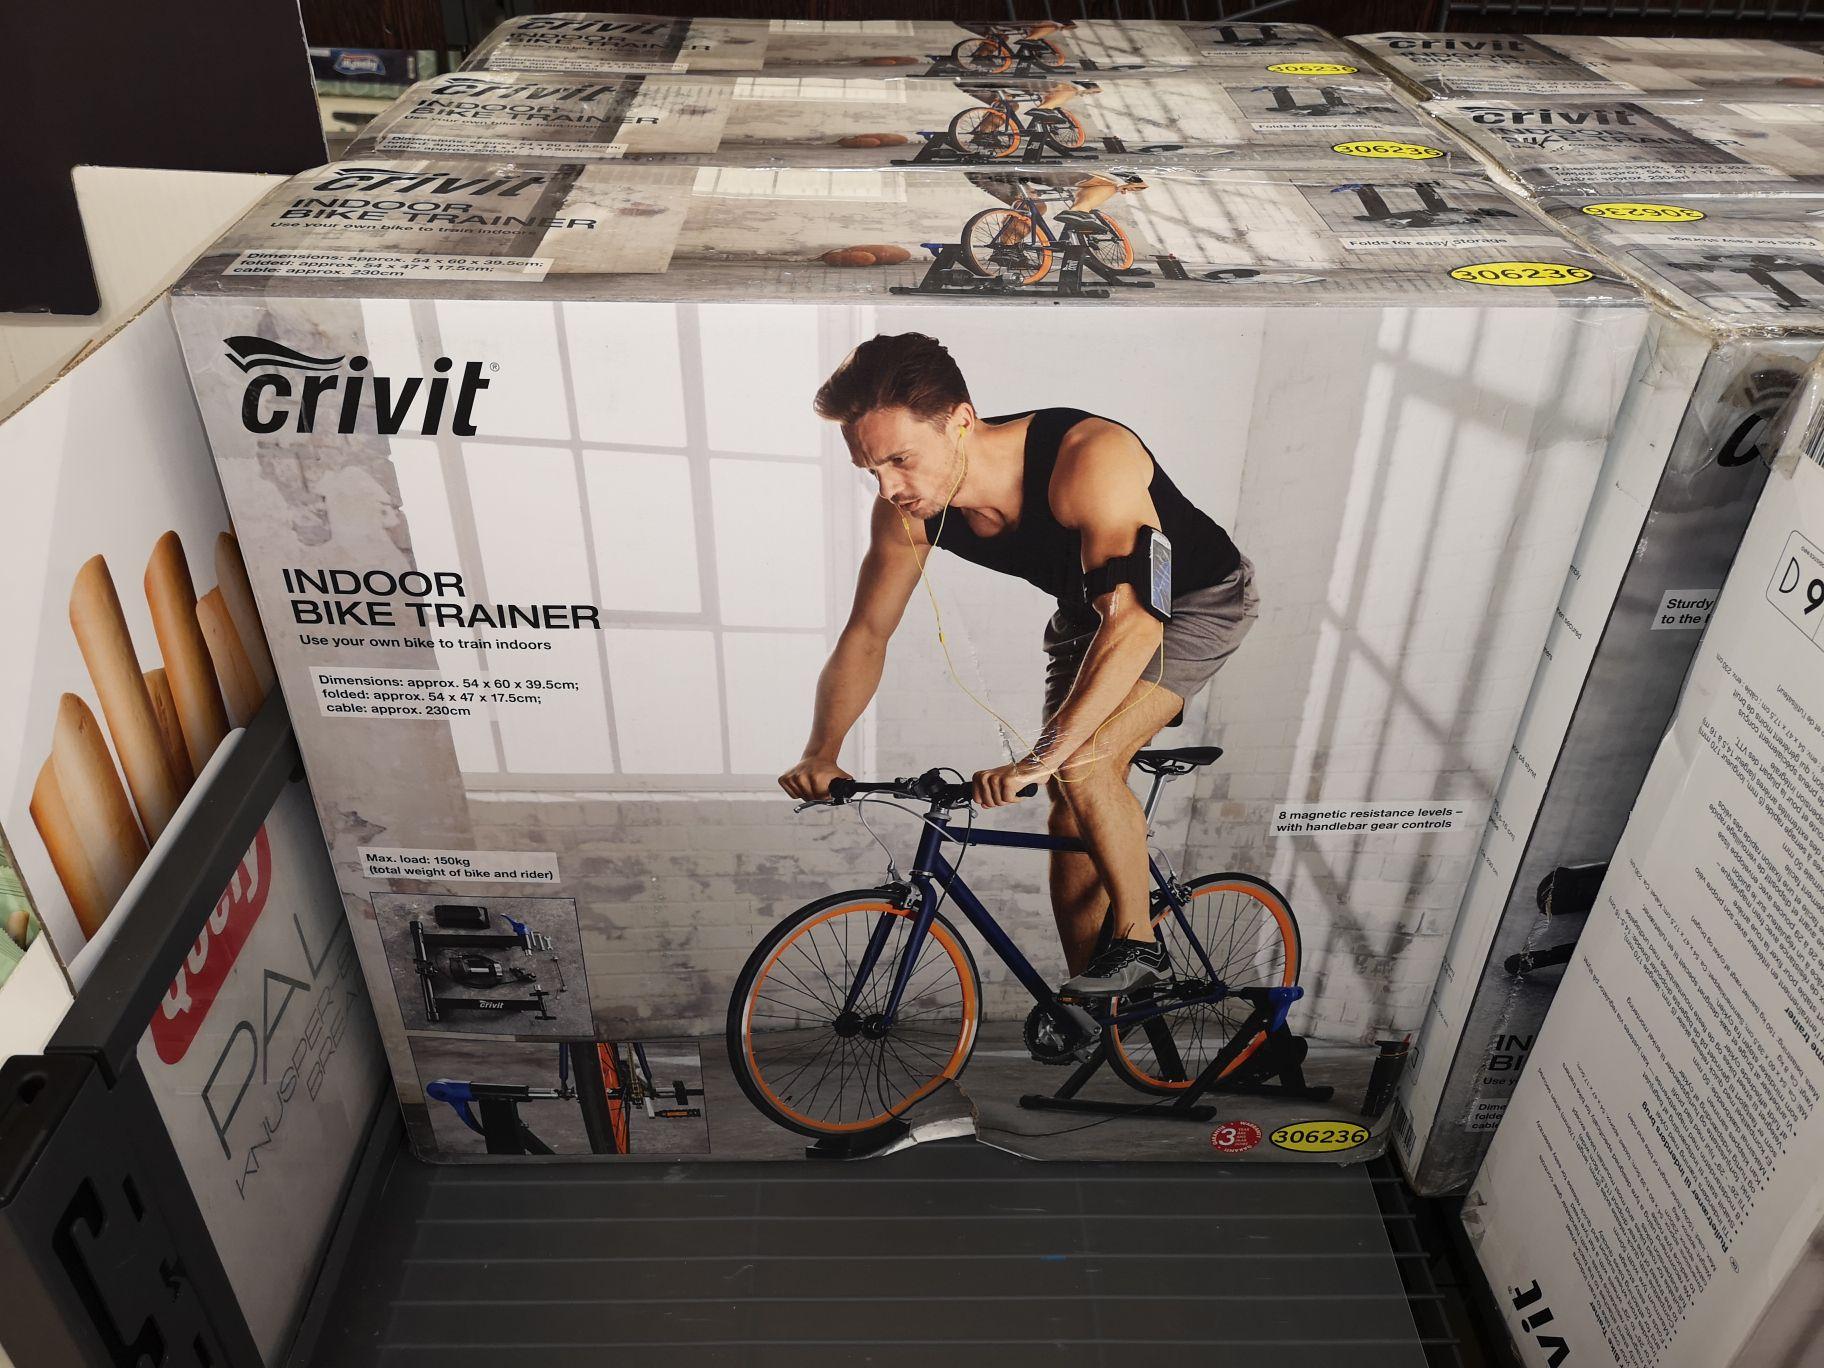 Crivit indoor bike trainer £29.99 @ LIDL